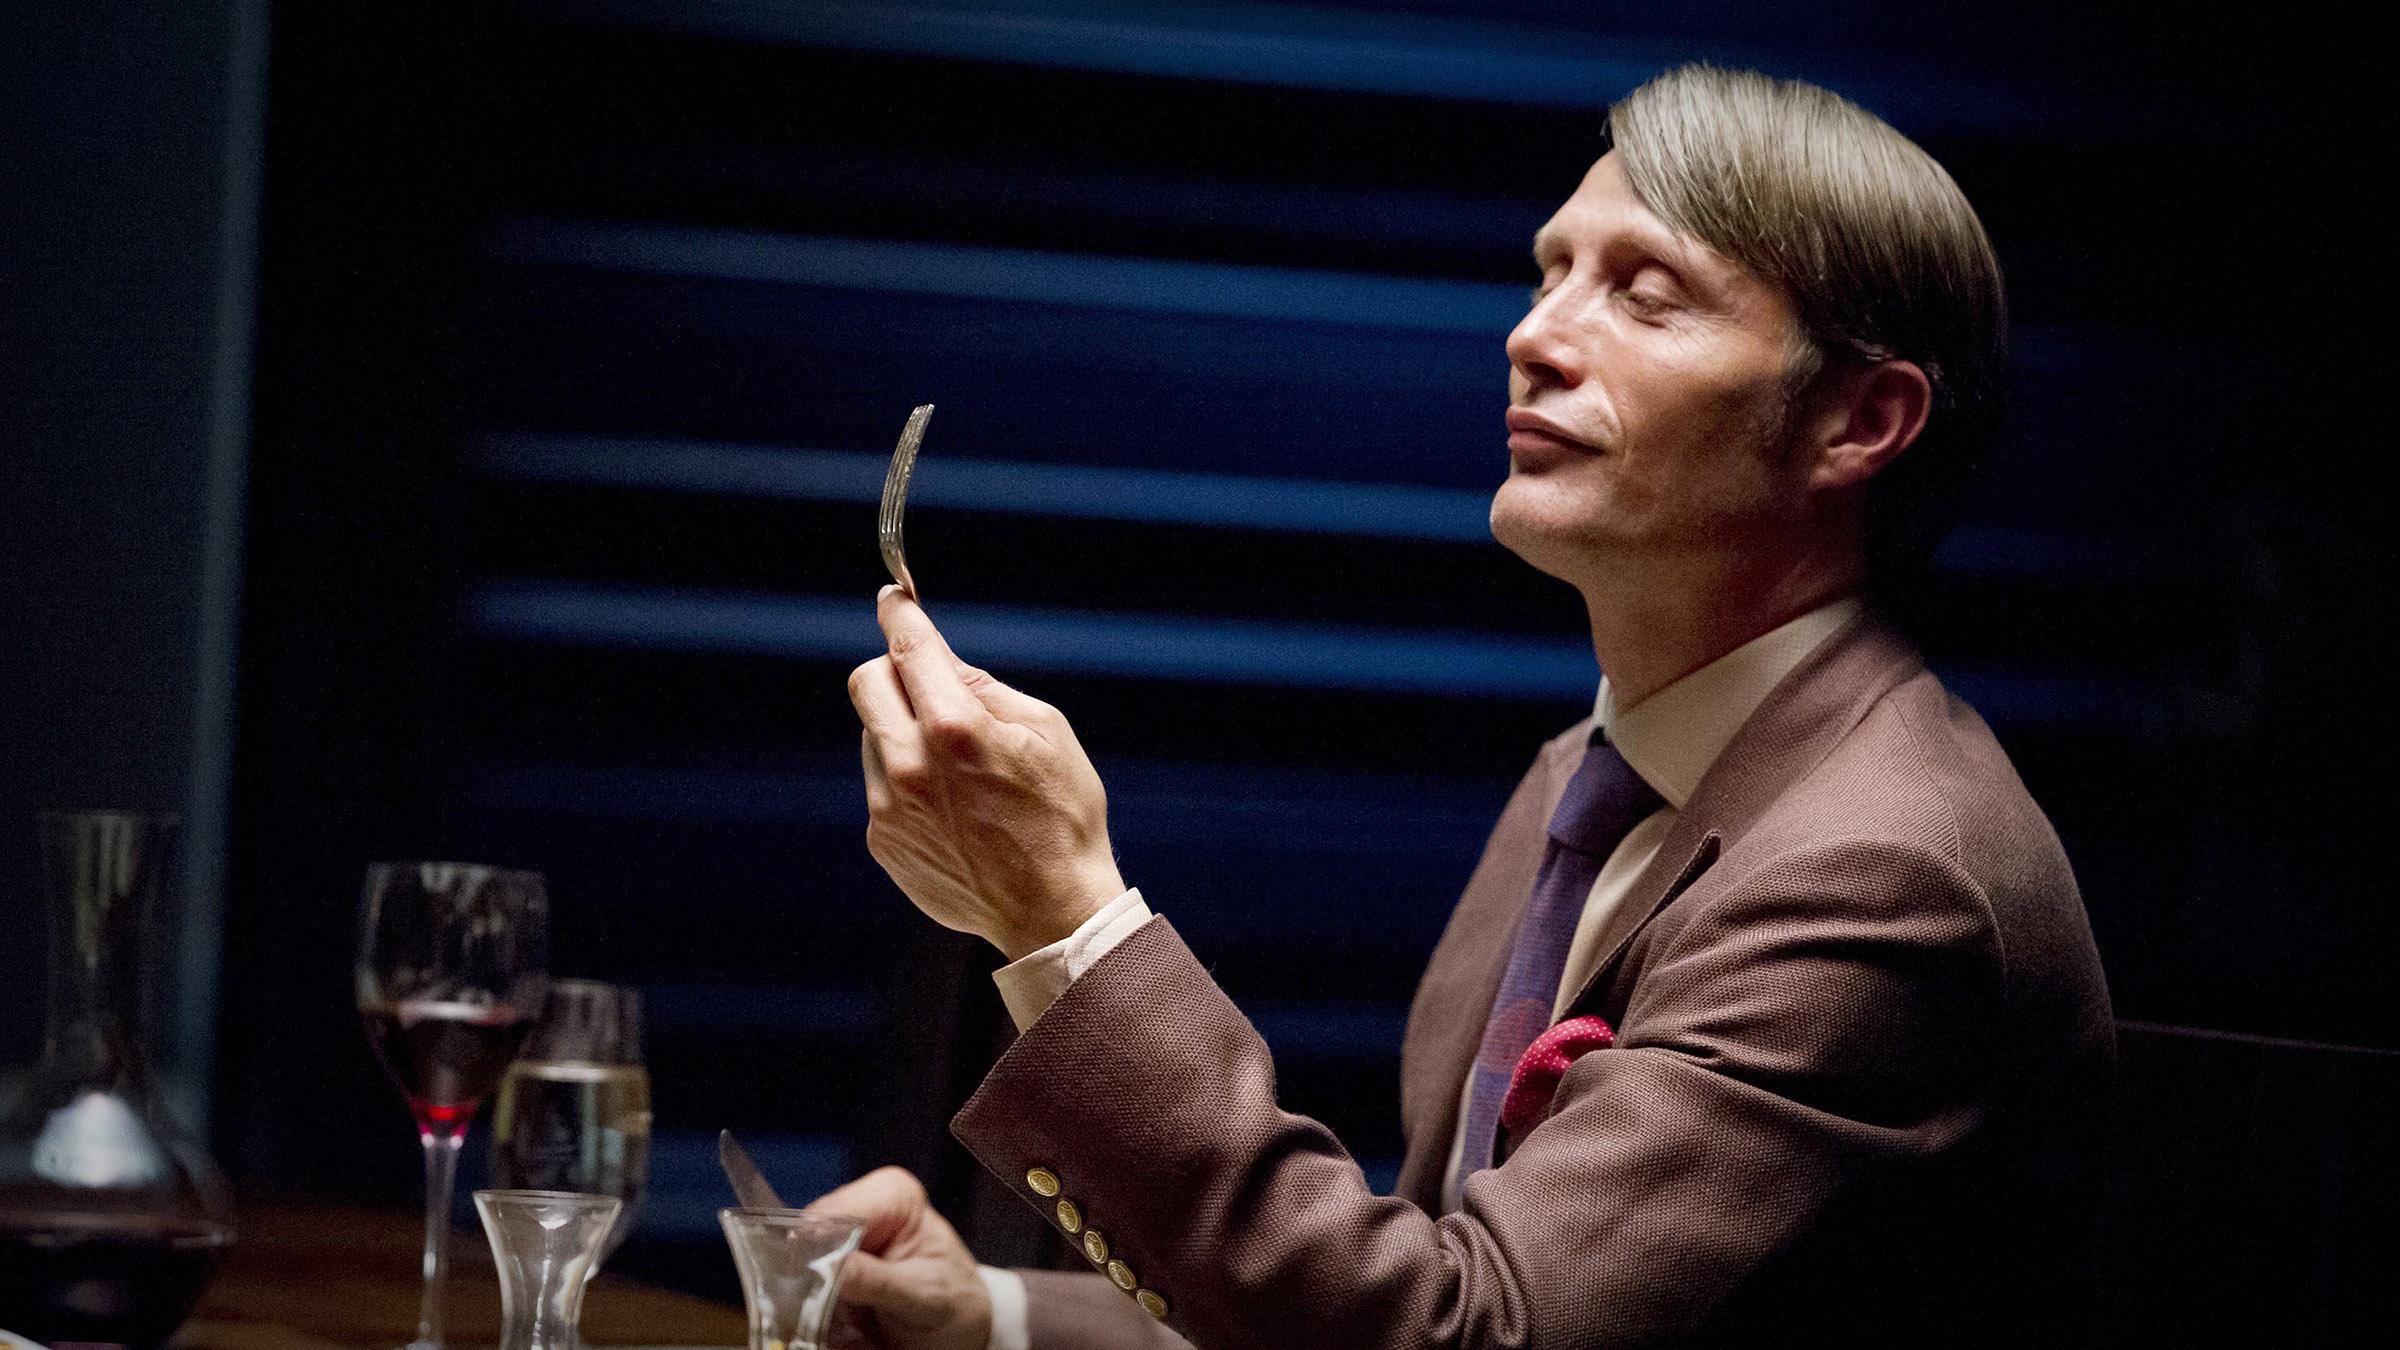 Hannibal creator bryan fuller not ruling out series return film hannibal creator bryan fuller not ruling out series return film independent izmirmasajfo